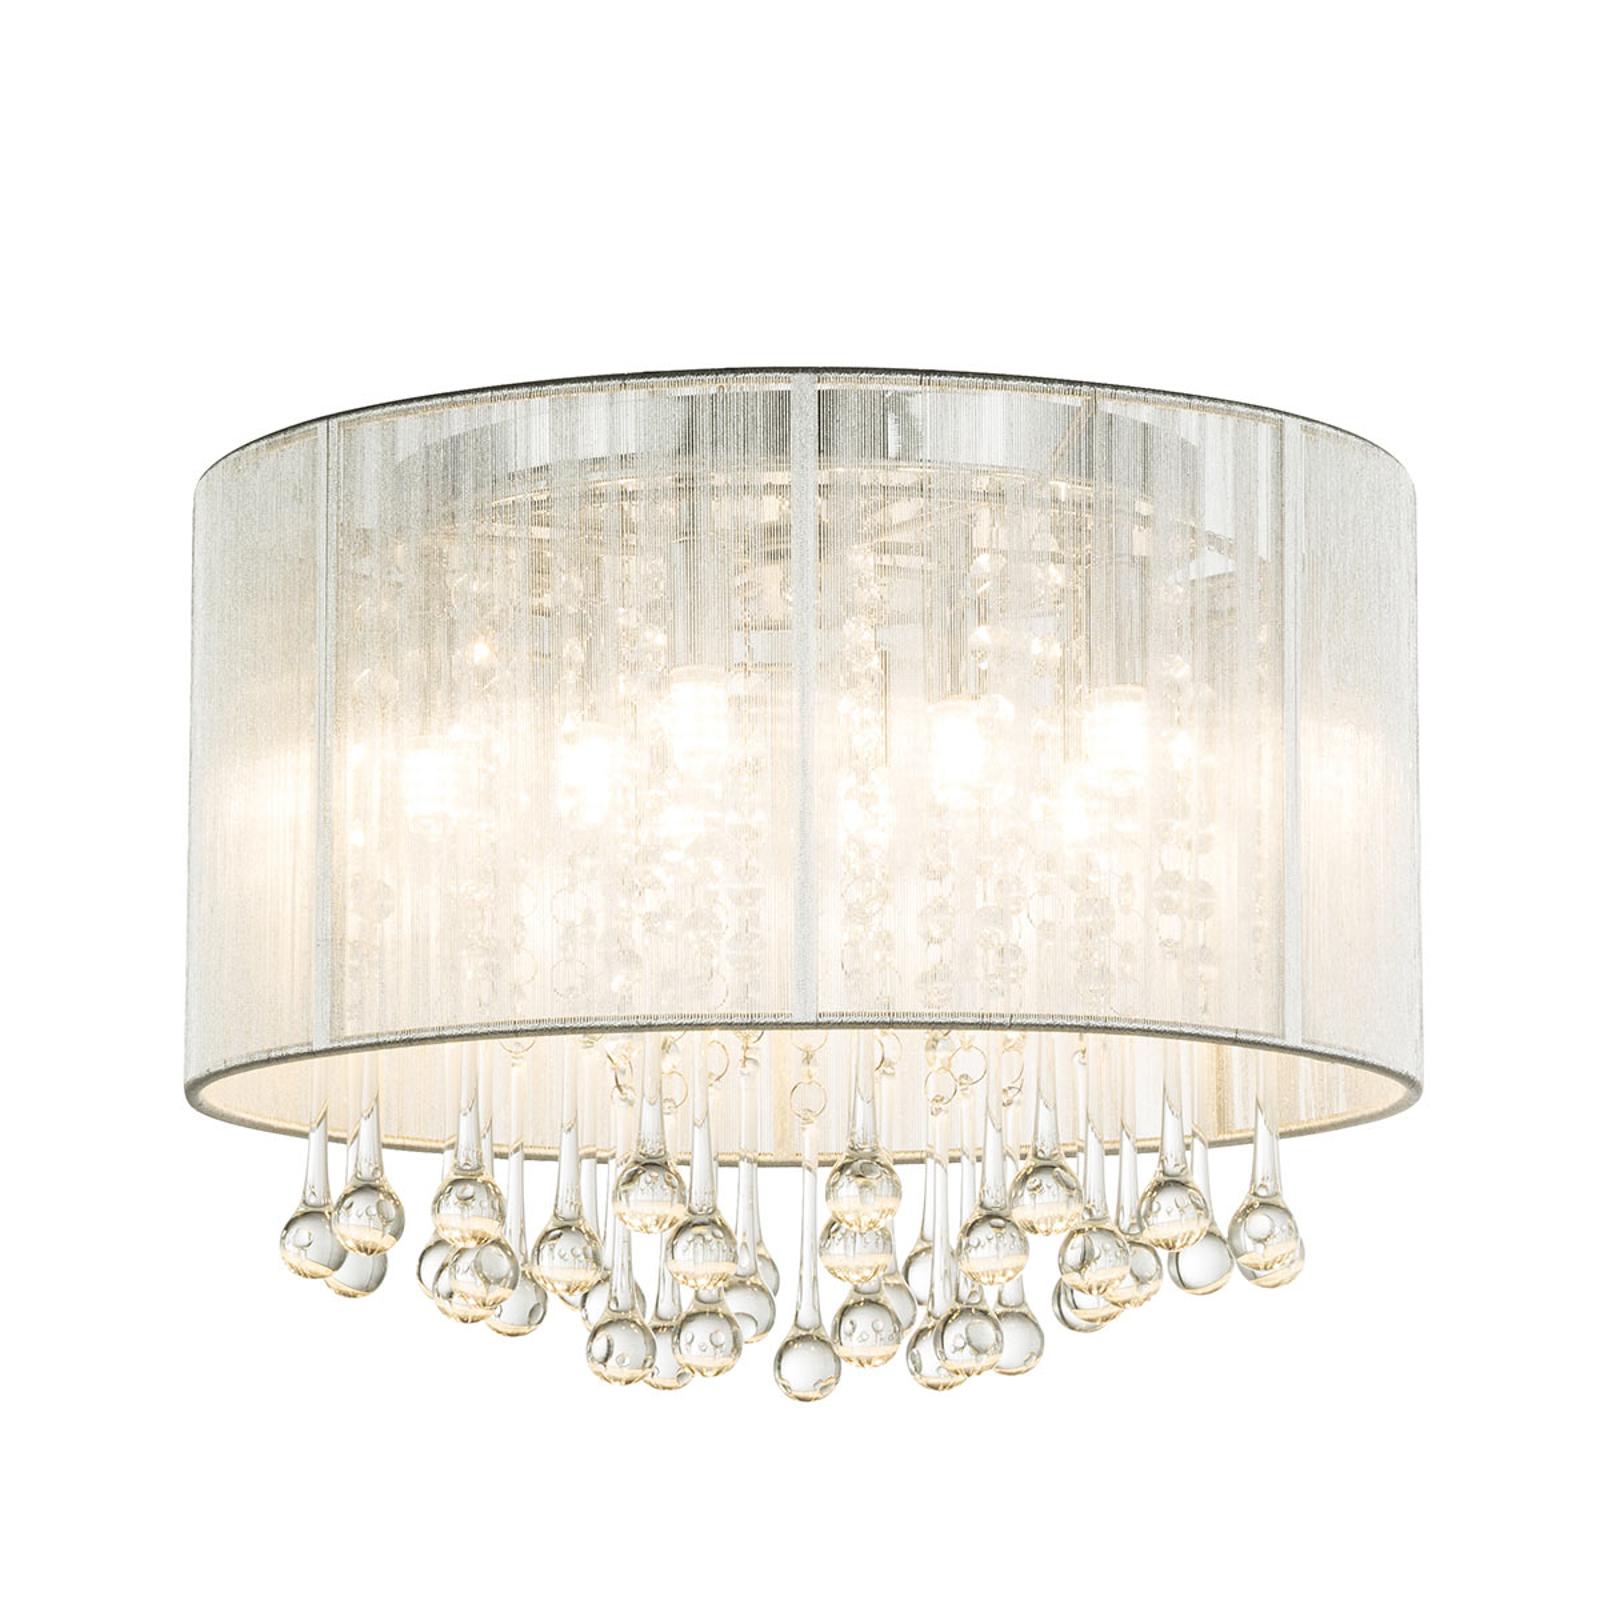 Zilveren LED plafondlamp Sierra met ornamenten